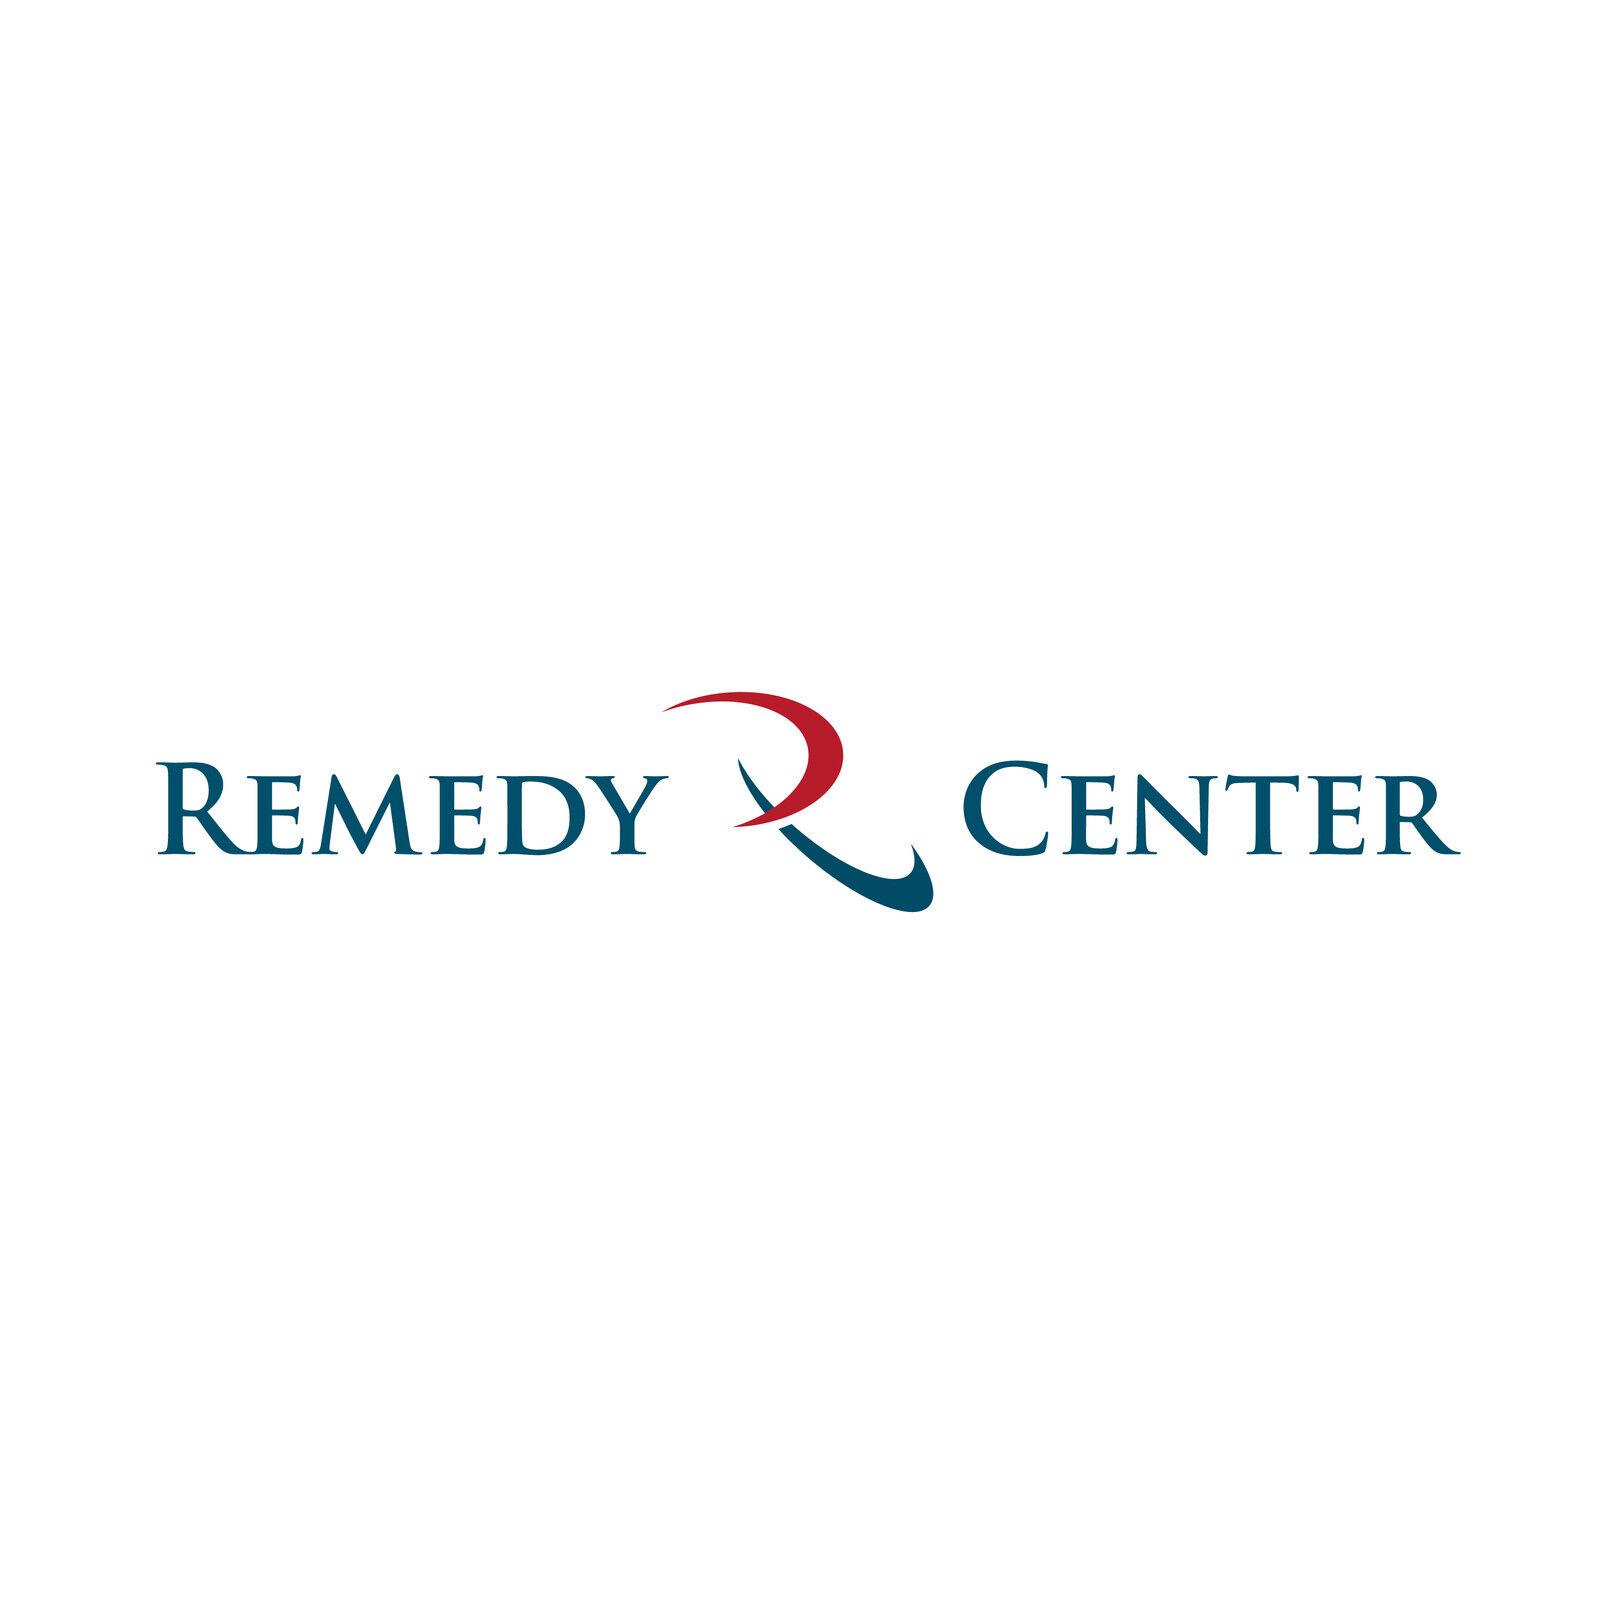 Remedy Center